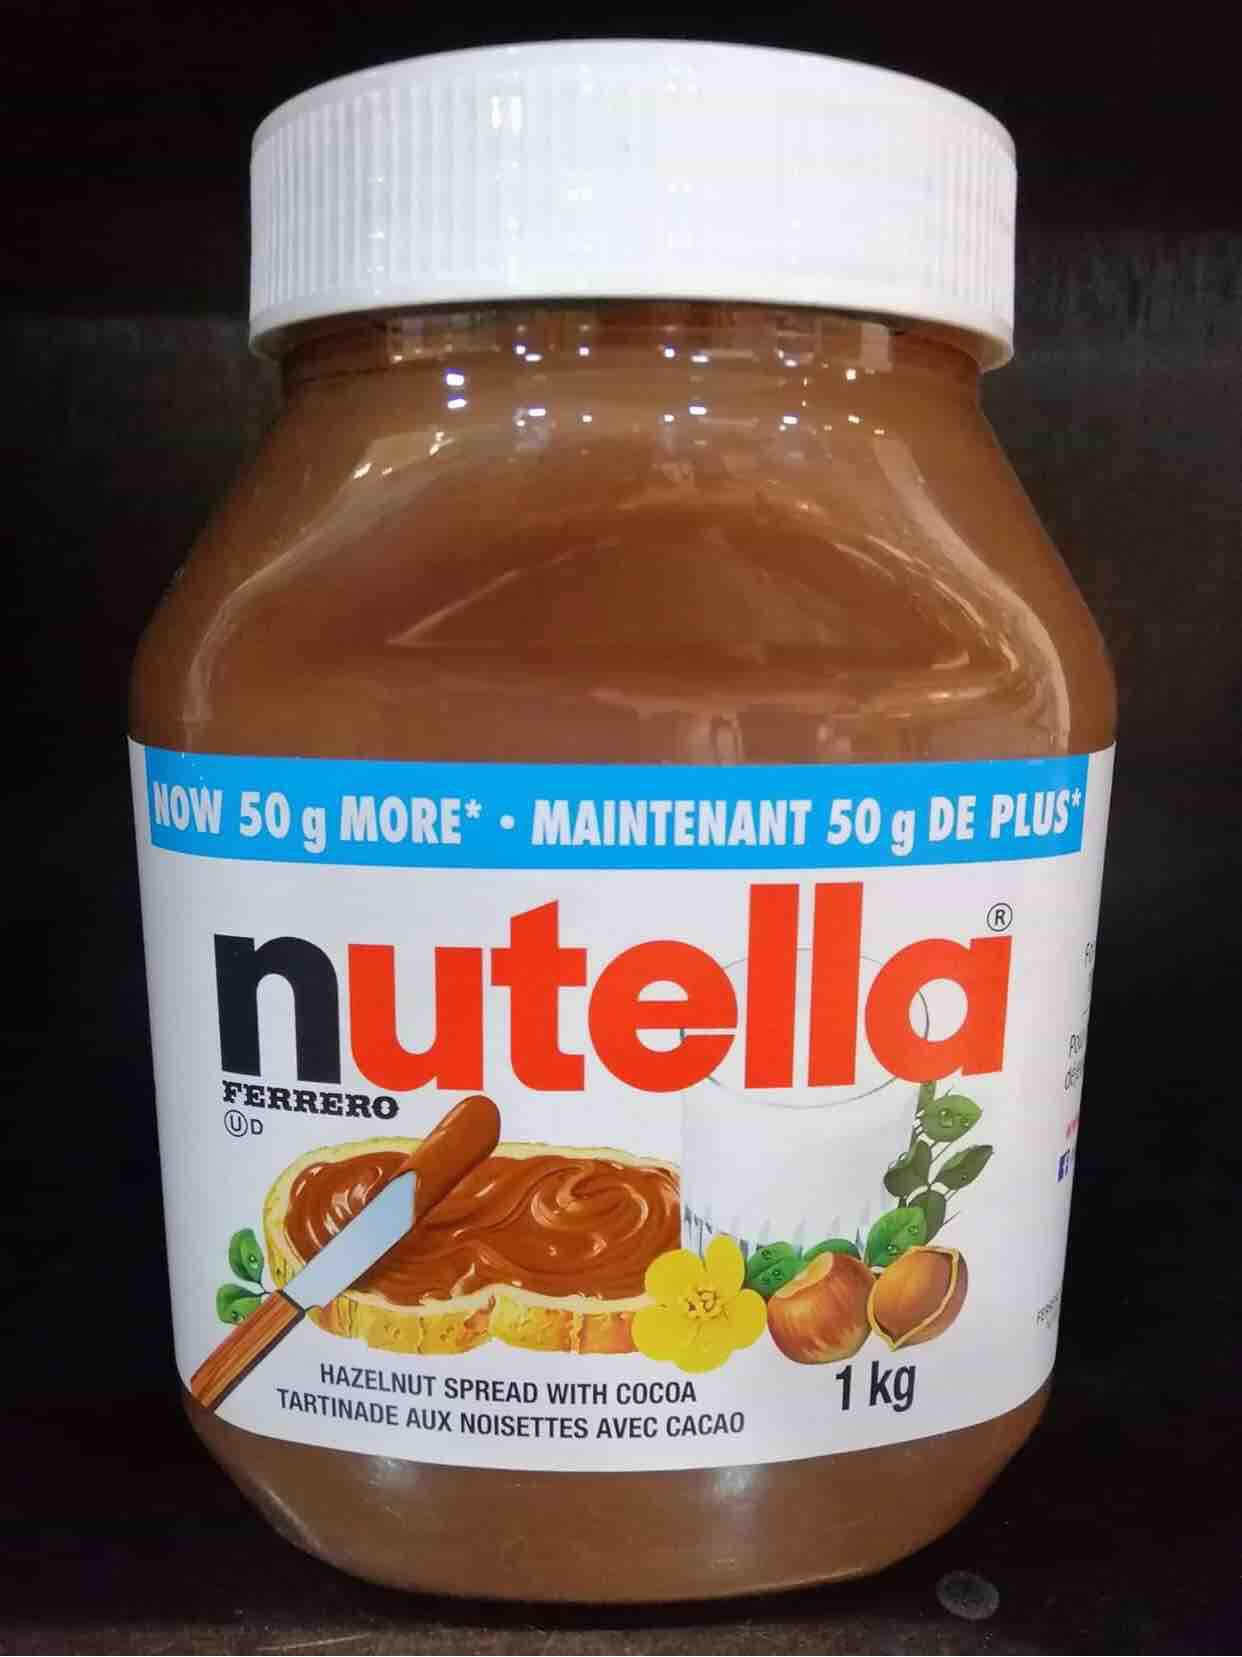 Nutella Price 50g